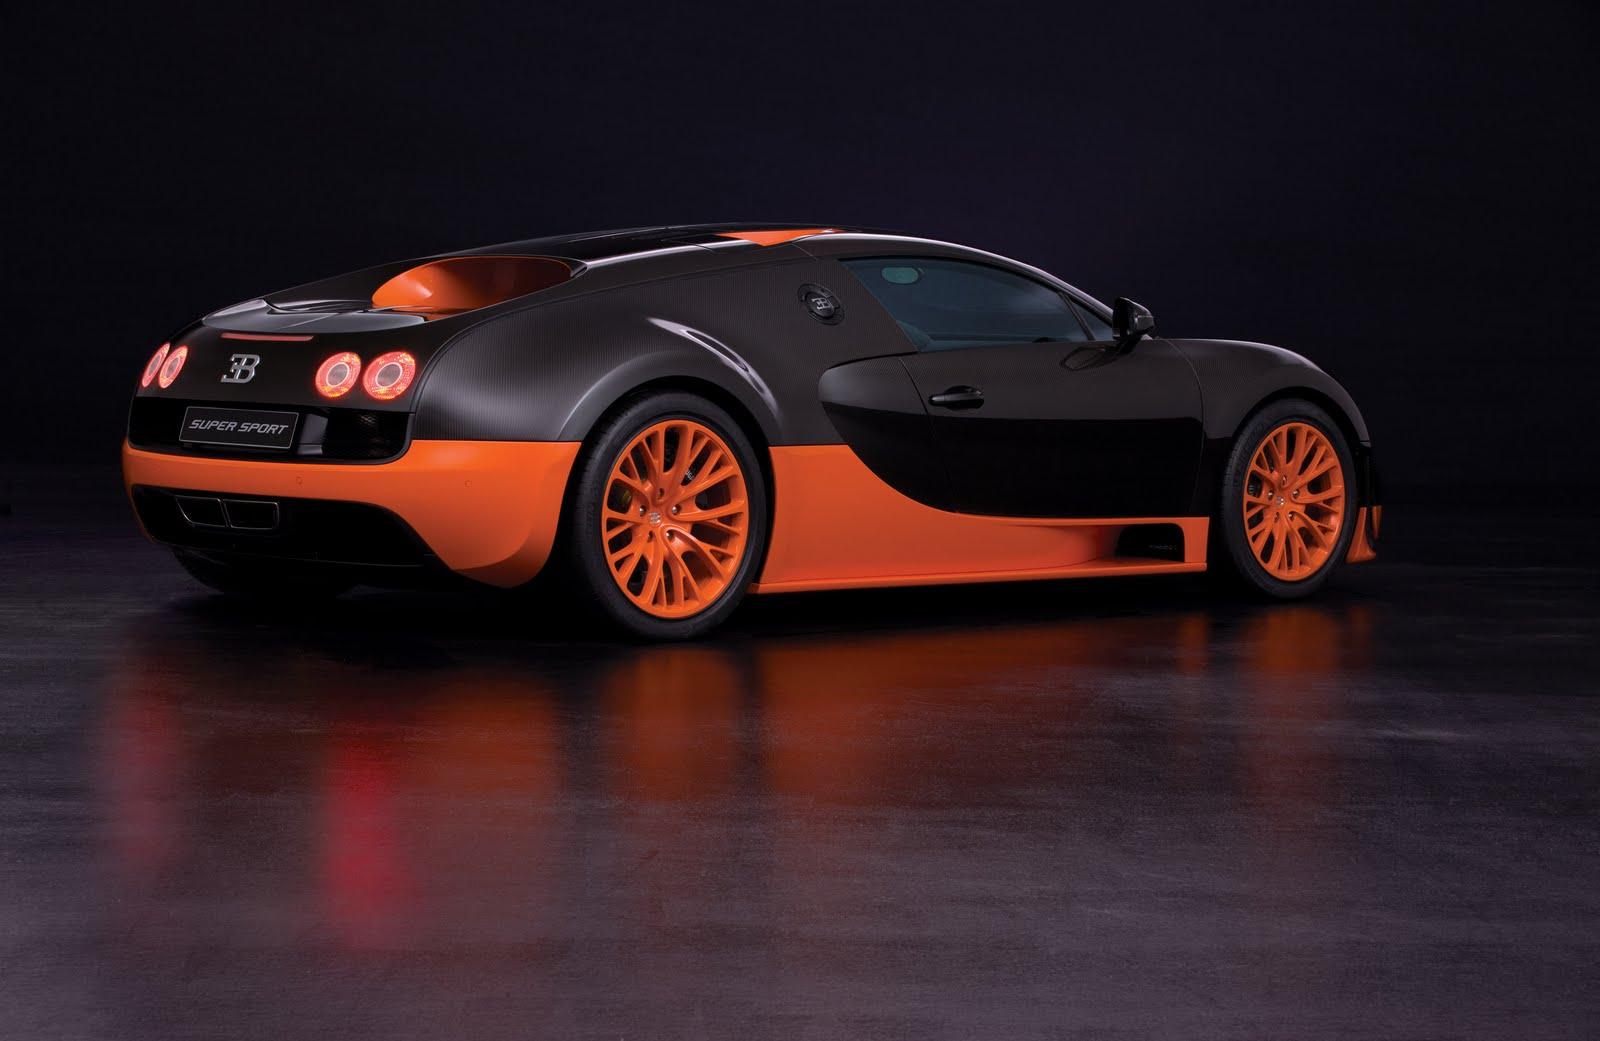 bugatti veyron 16 4 super sport 2011 automotive todays. Black Bedroom Furniture Sets. Home Design Ideas